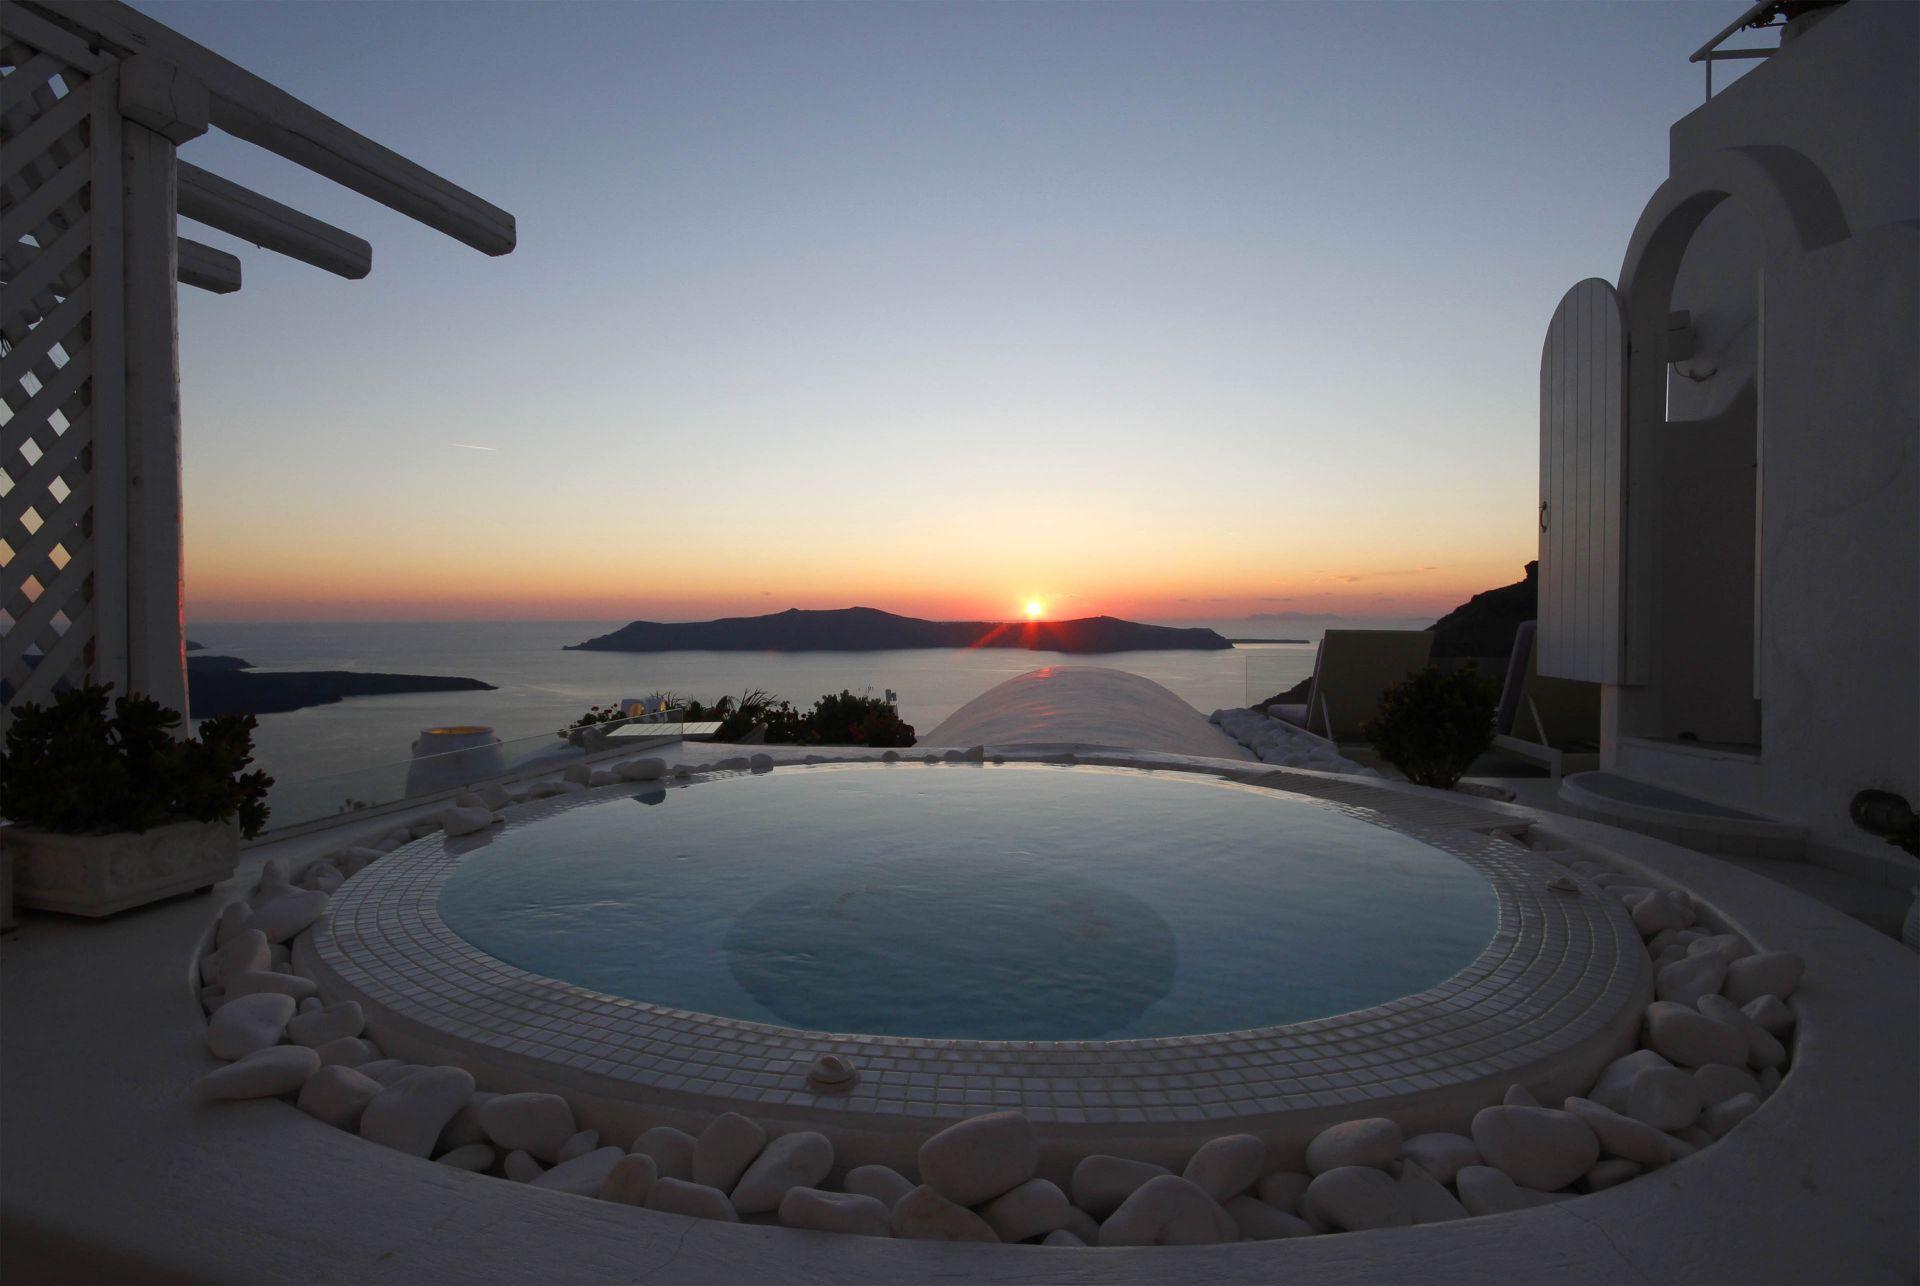 Greece hotels: Accommodation in Greece